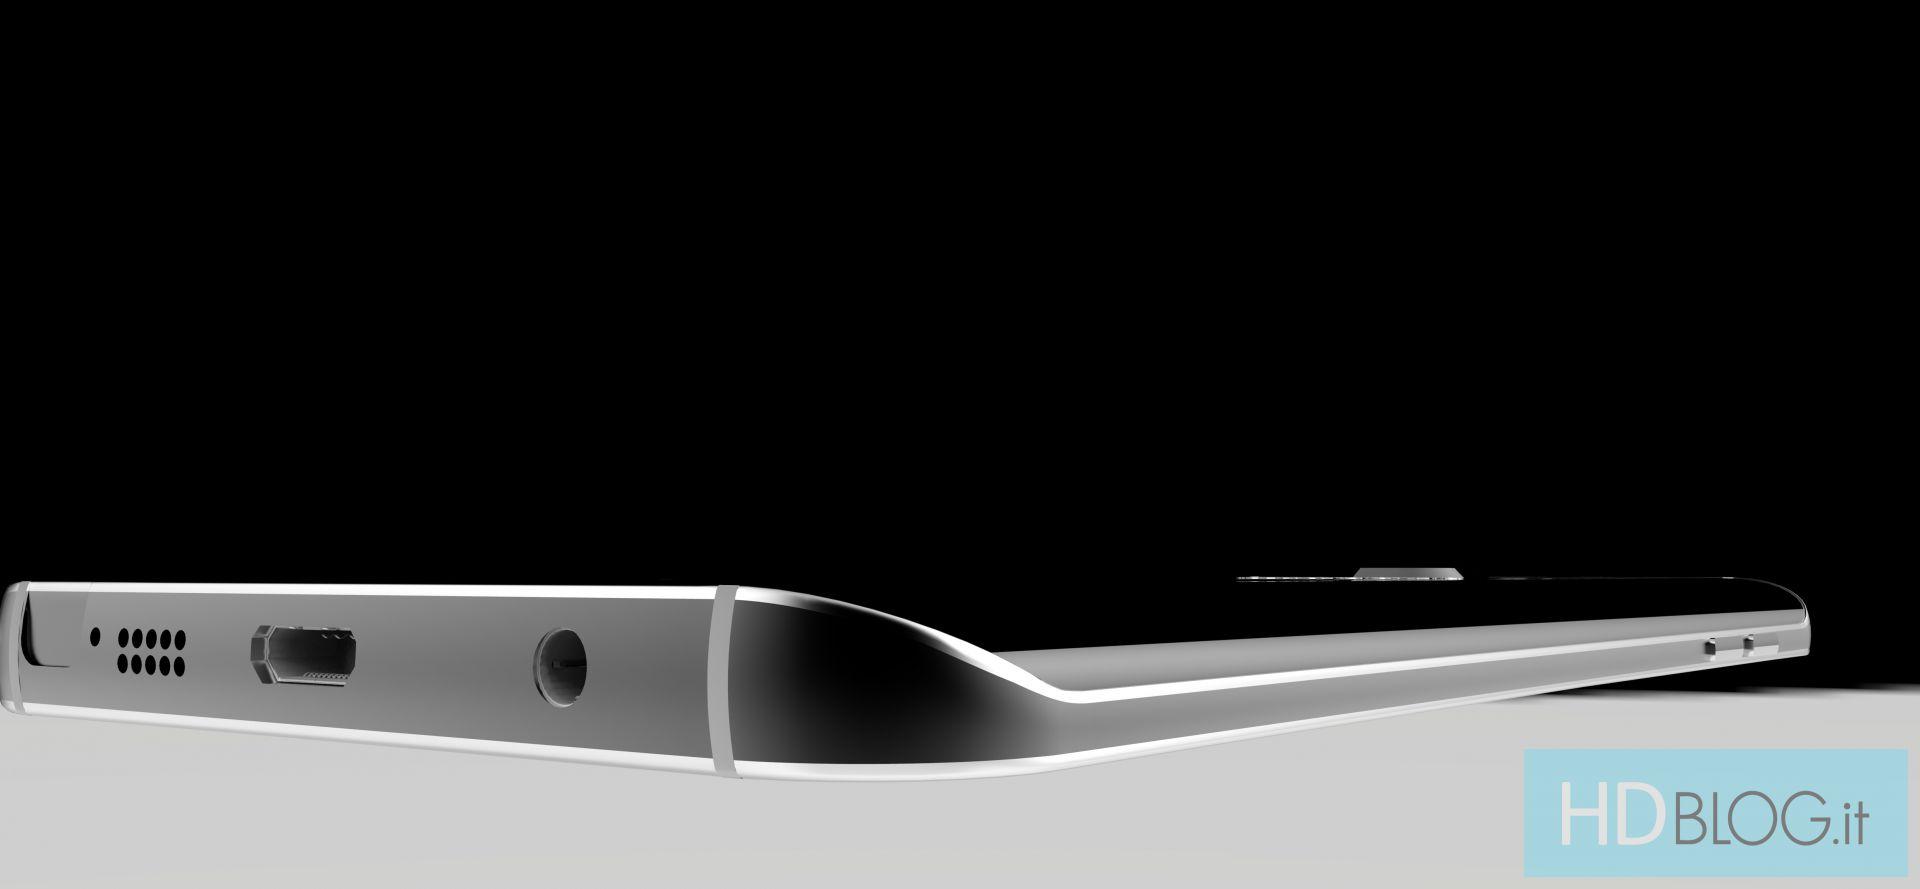 Galaxy-Note-5-schematics-and-concept-renders-17.jpg